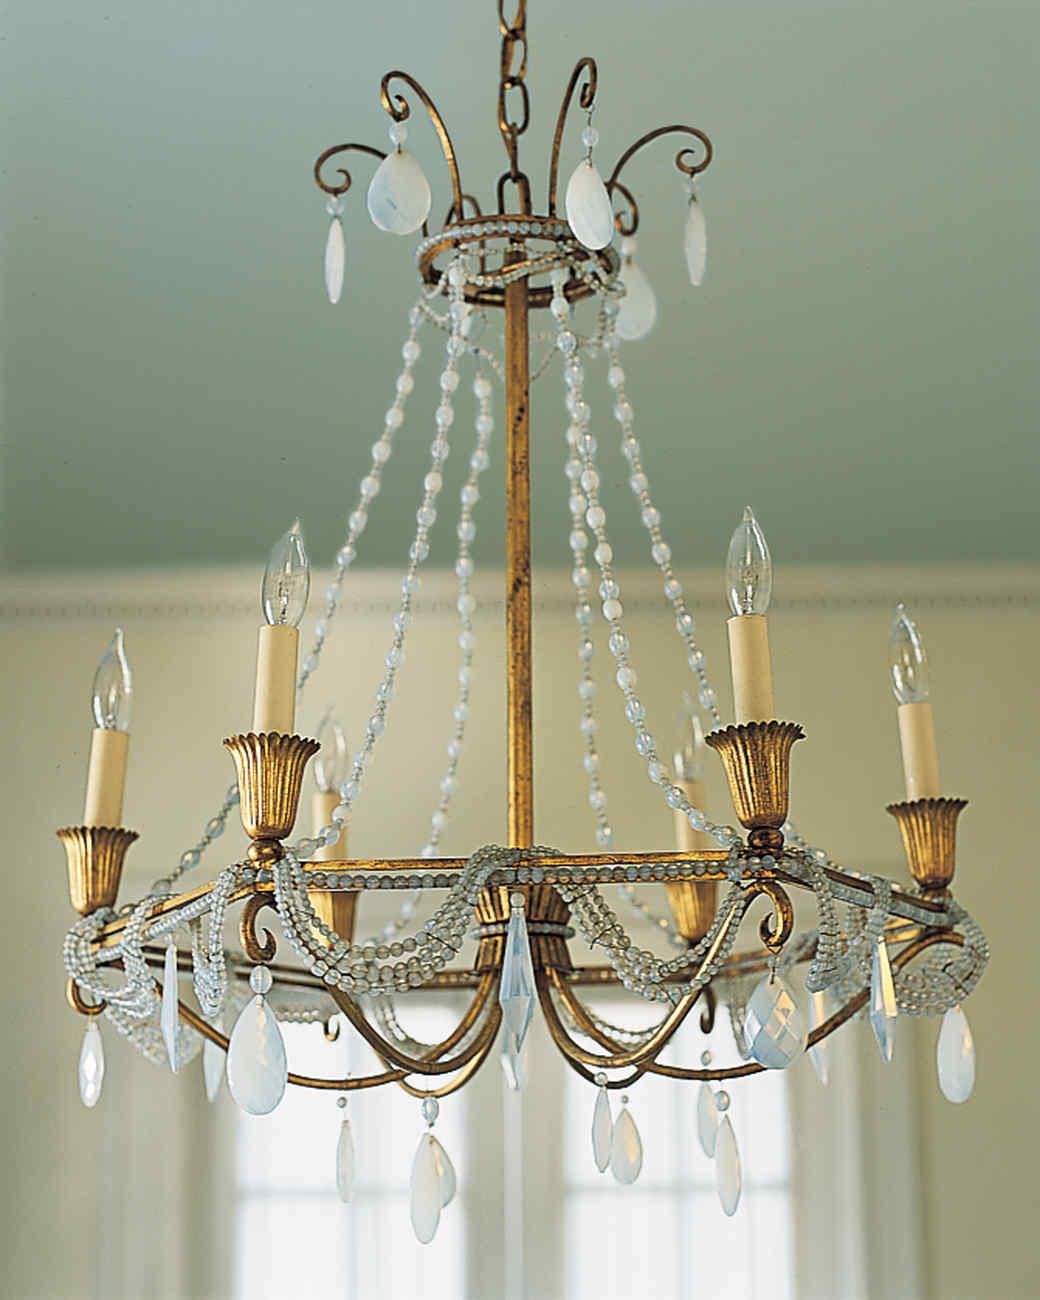 chandelier-subtle-transformation-01-d100768-0815.jpg